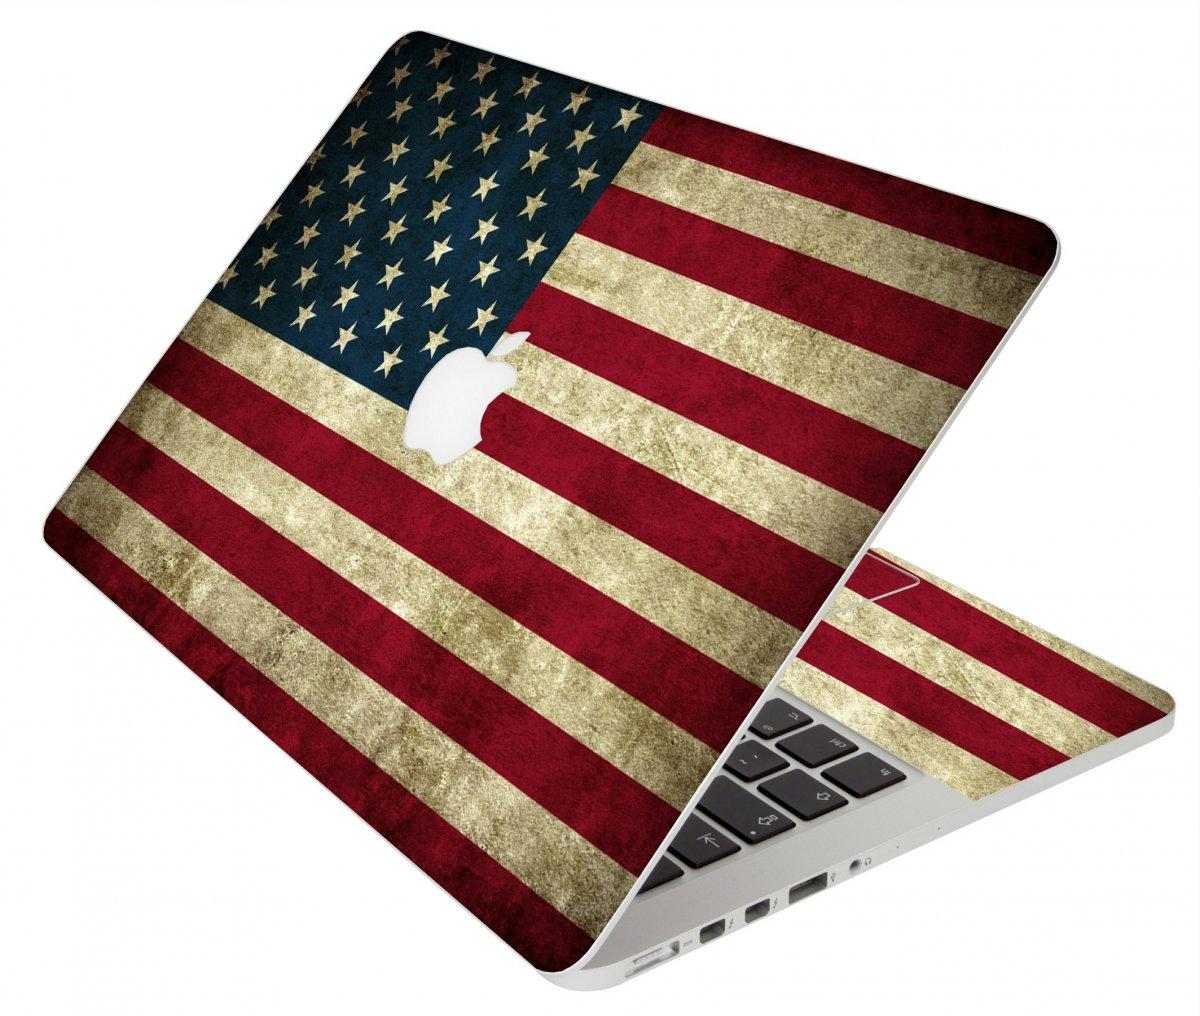 AMERICAN FLAG MacBook Pro 12 Retina A1534 Laptop Skin